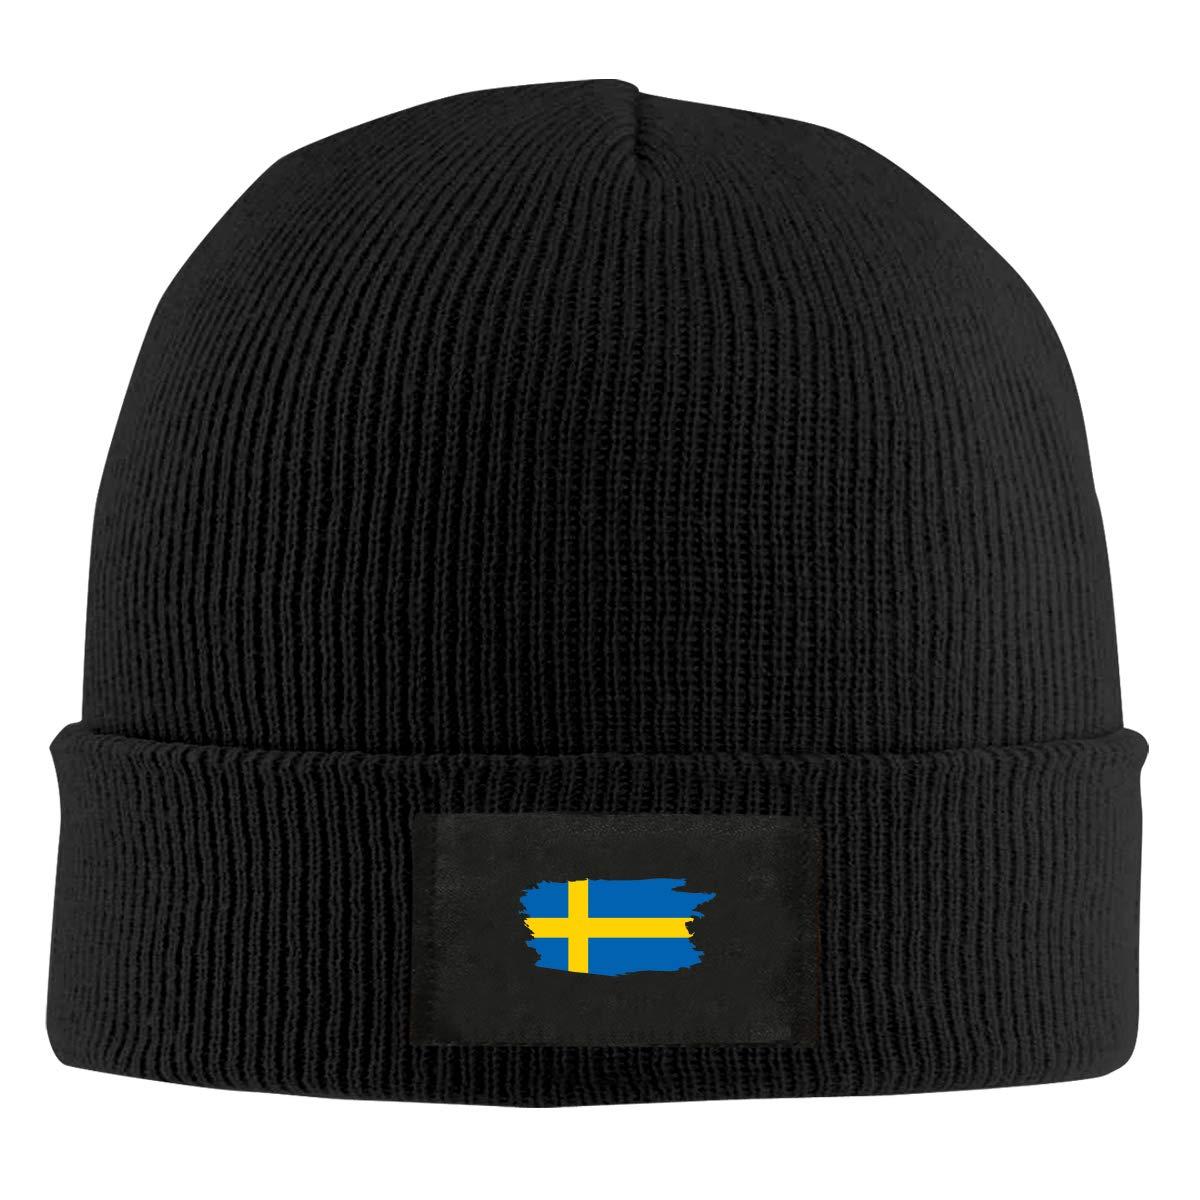 Xdinfong Swedish Flag Winter Beanie Hat Knit Hat Cap for Men /& Women